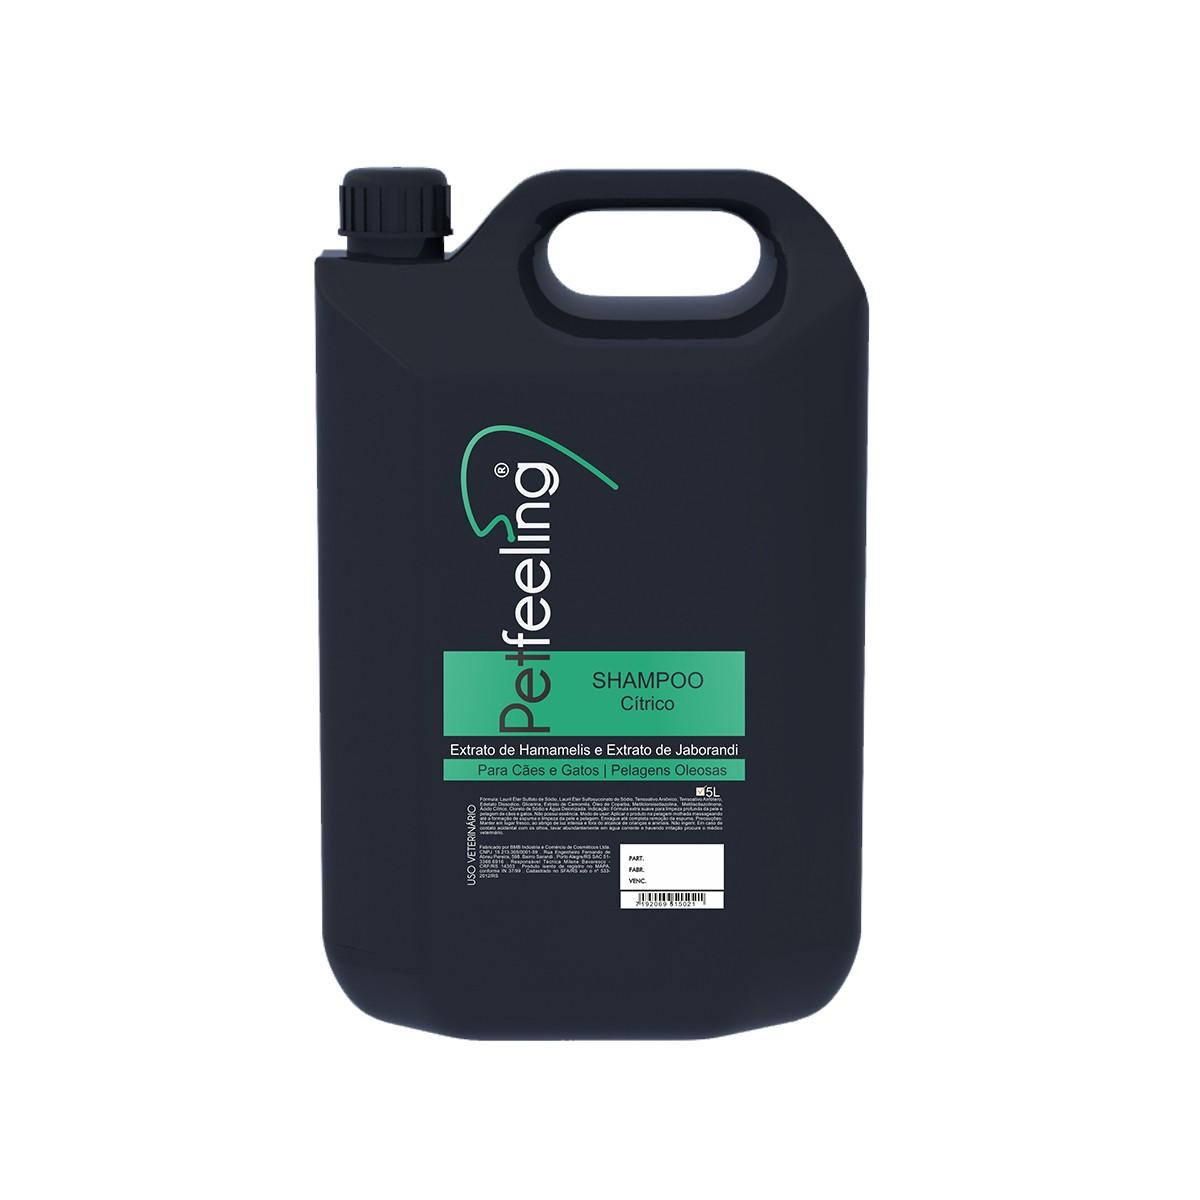 Shampoo Citríco 5L Petfeeling